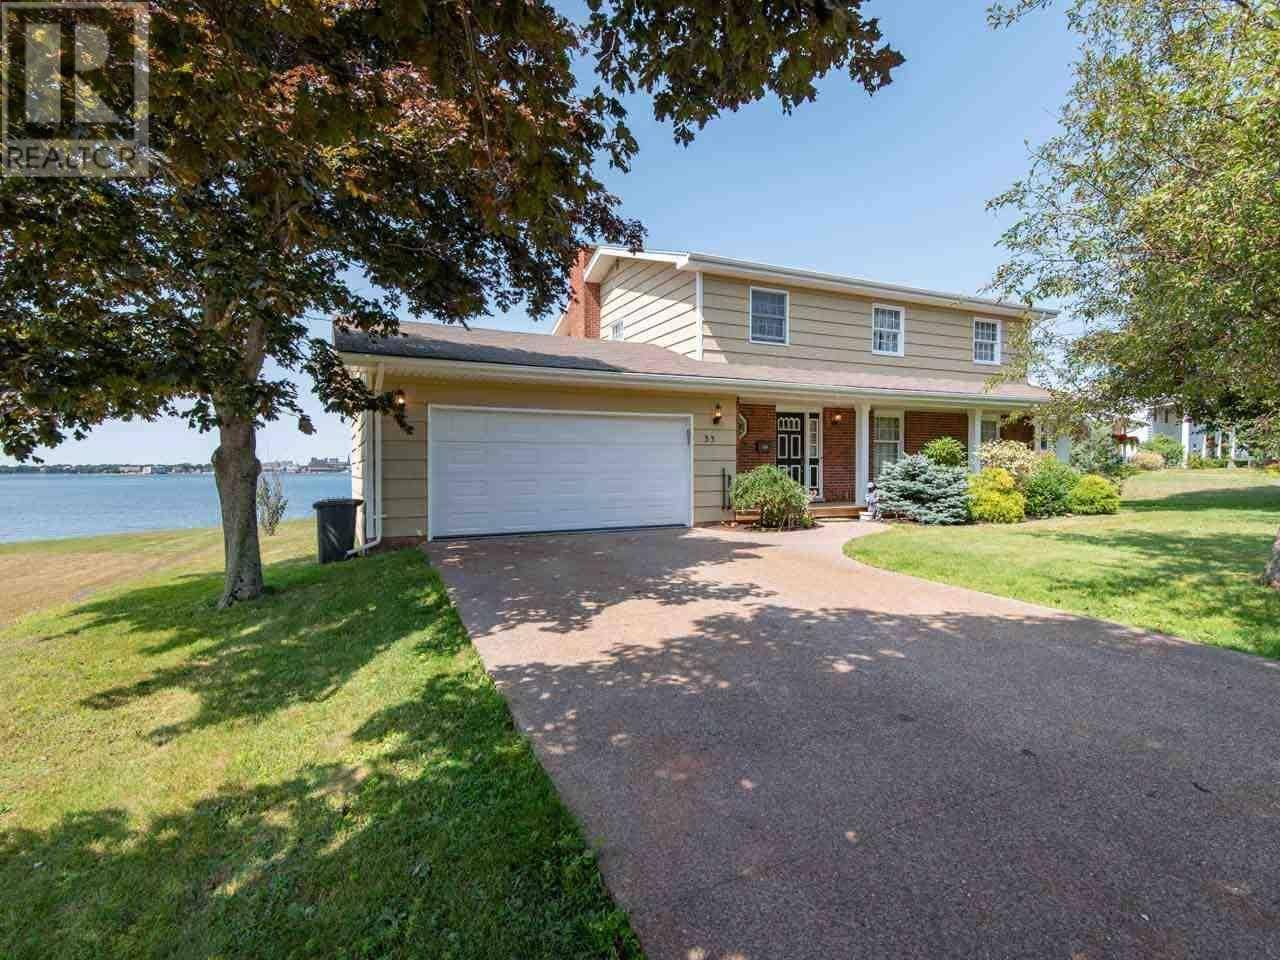 House for sale at 33 Glencove Dr Stratford Prince Edward Island - MLS: 201908589